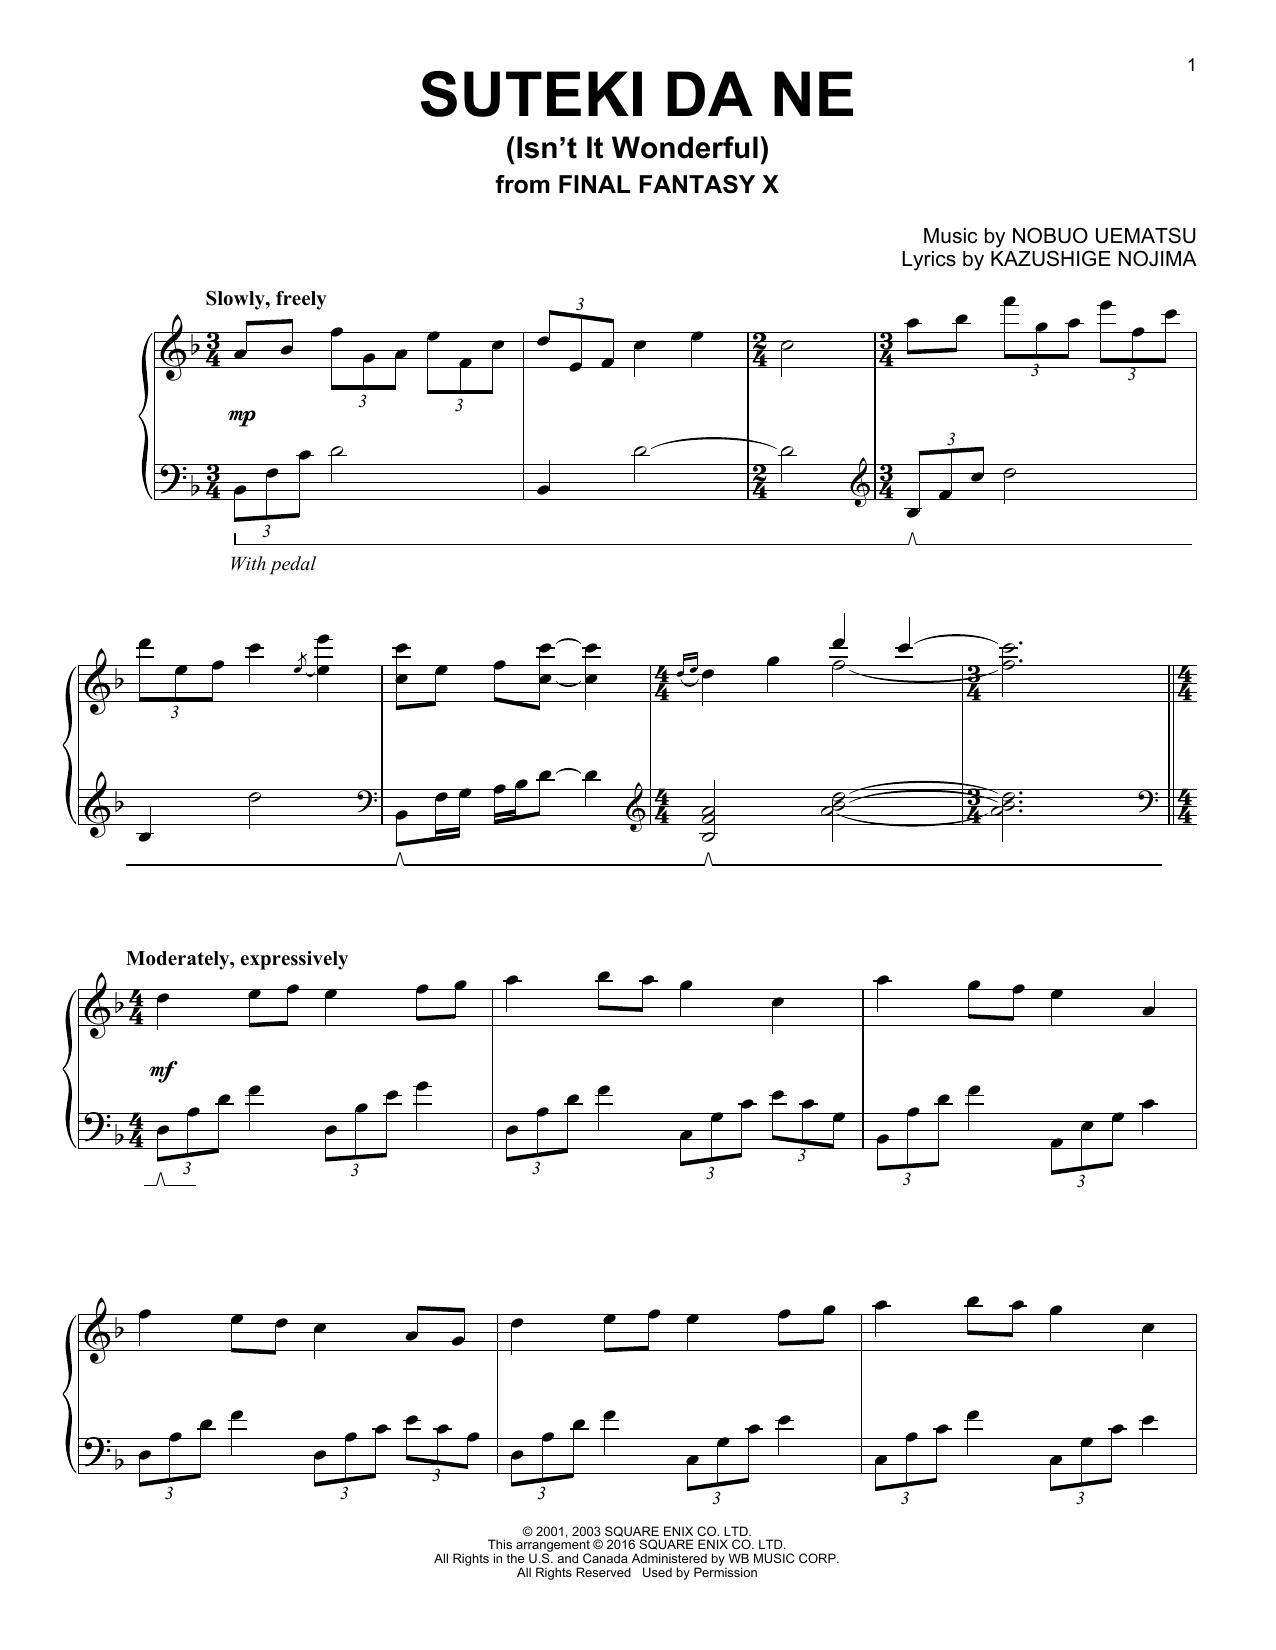 Kazushige Nojima Suteki Da Ne (Isn't It Wonderful) sheet music notes and chords